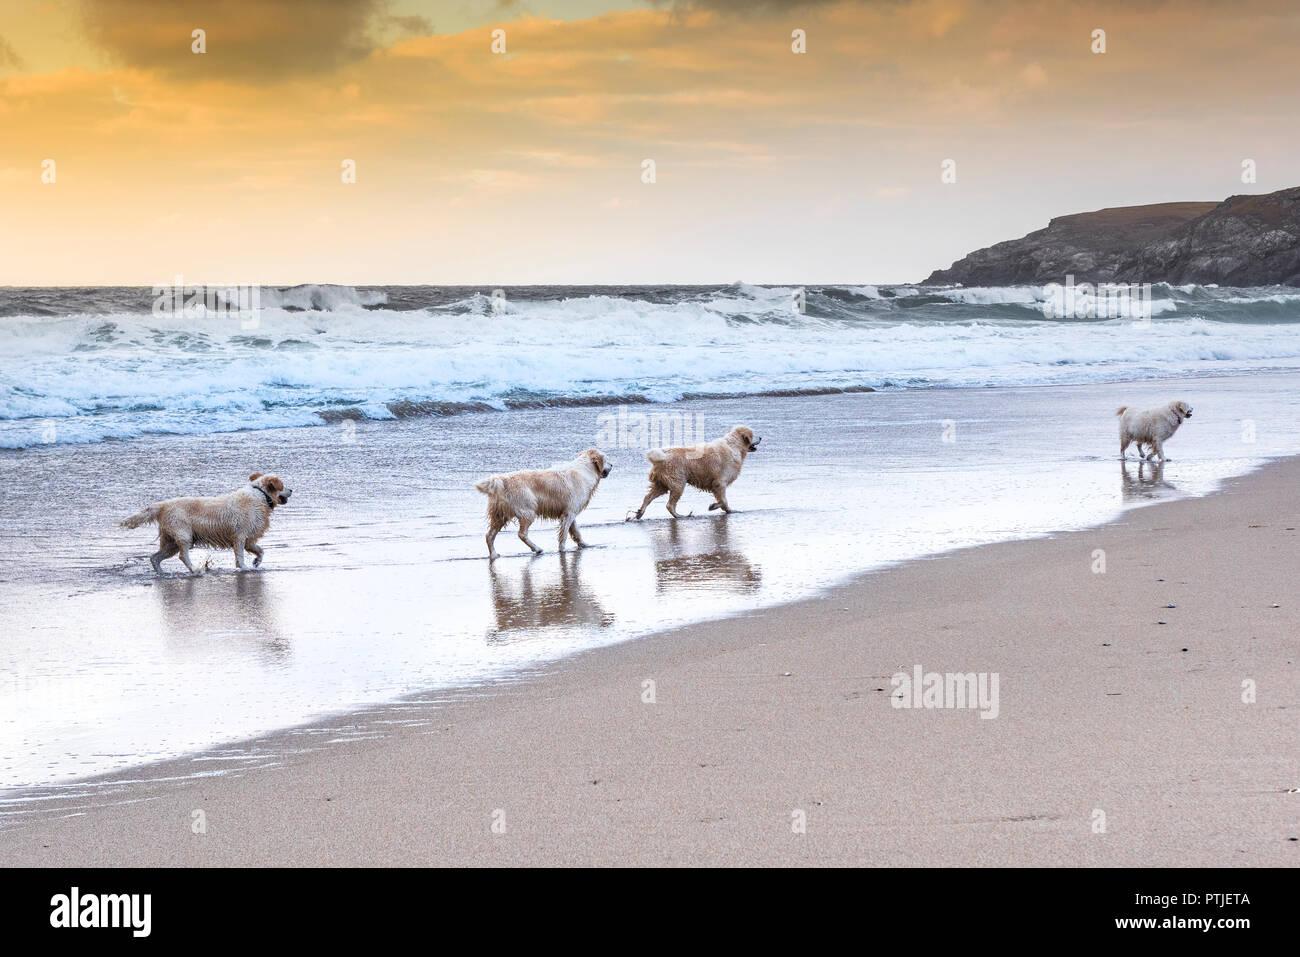 Golden Retrievers enjoying a walk along the shoreline at Holywell Bay beach in Cornwall. - Stock Image